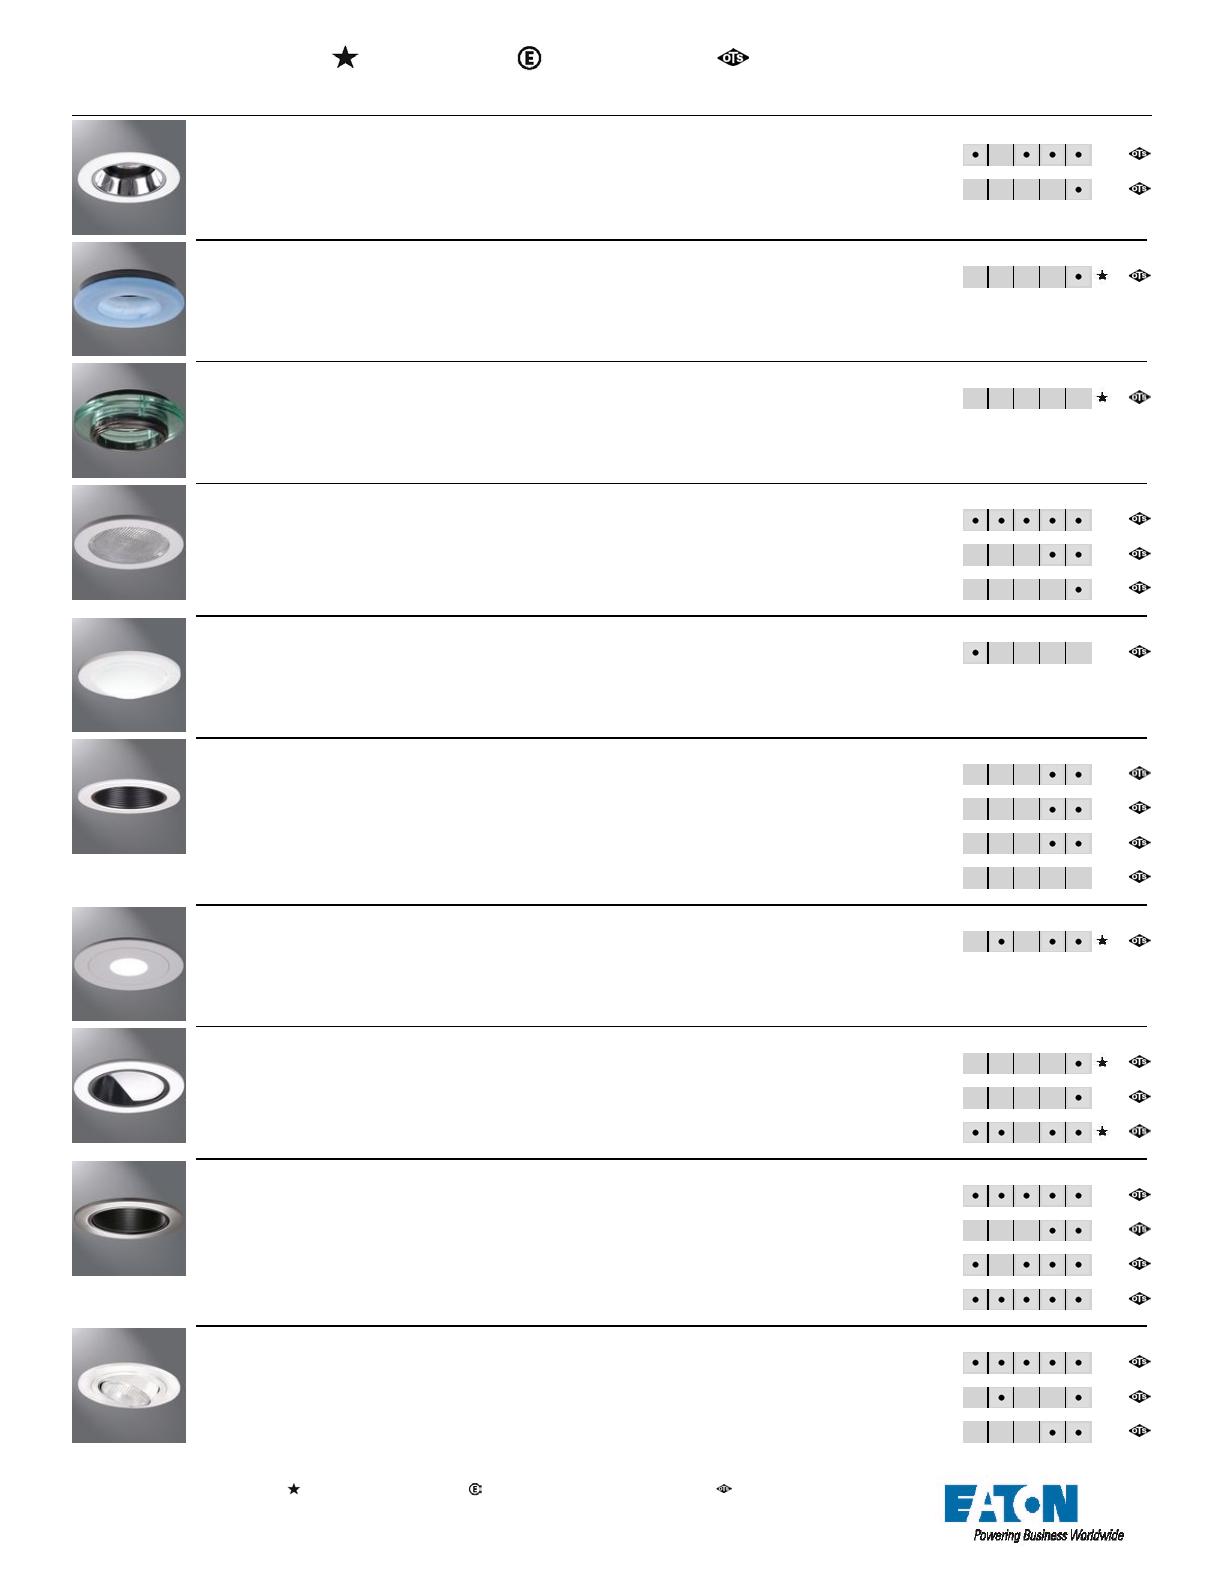 LED Lamp 3500K Cooper ERM6A20835 Power Module 80 CRI 120-277v 2000 lumens